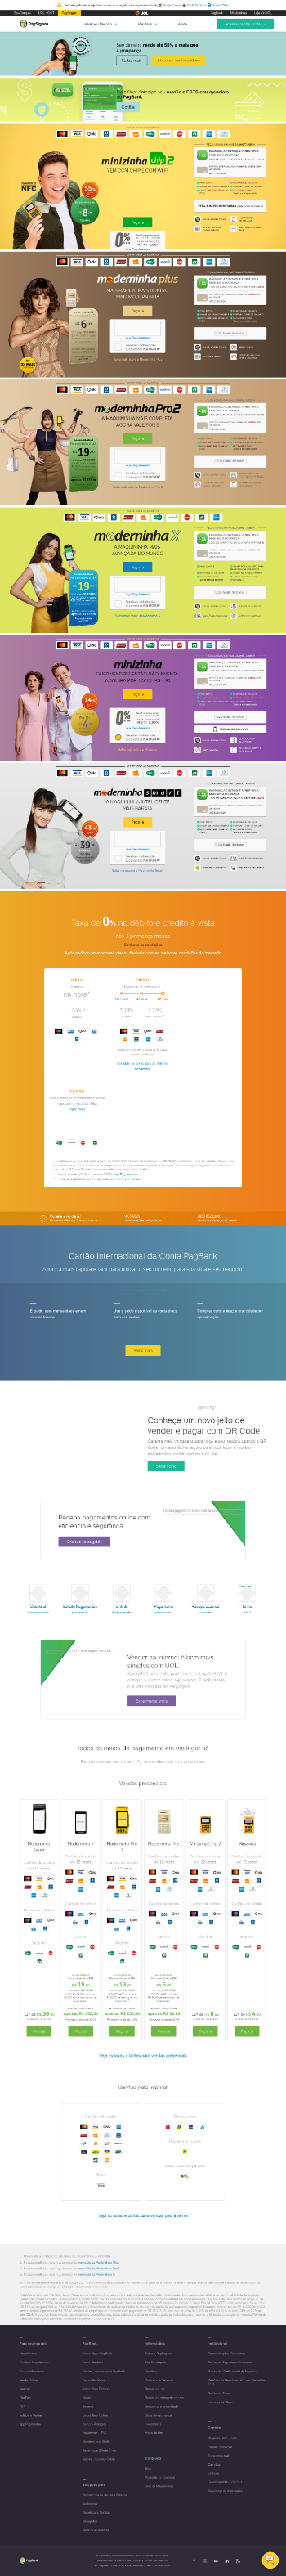 PagSeguro Digital Ltd. Website Screenshot